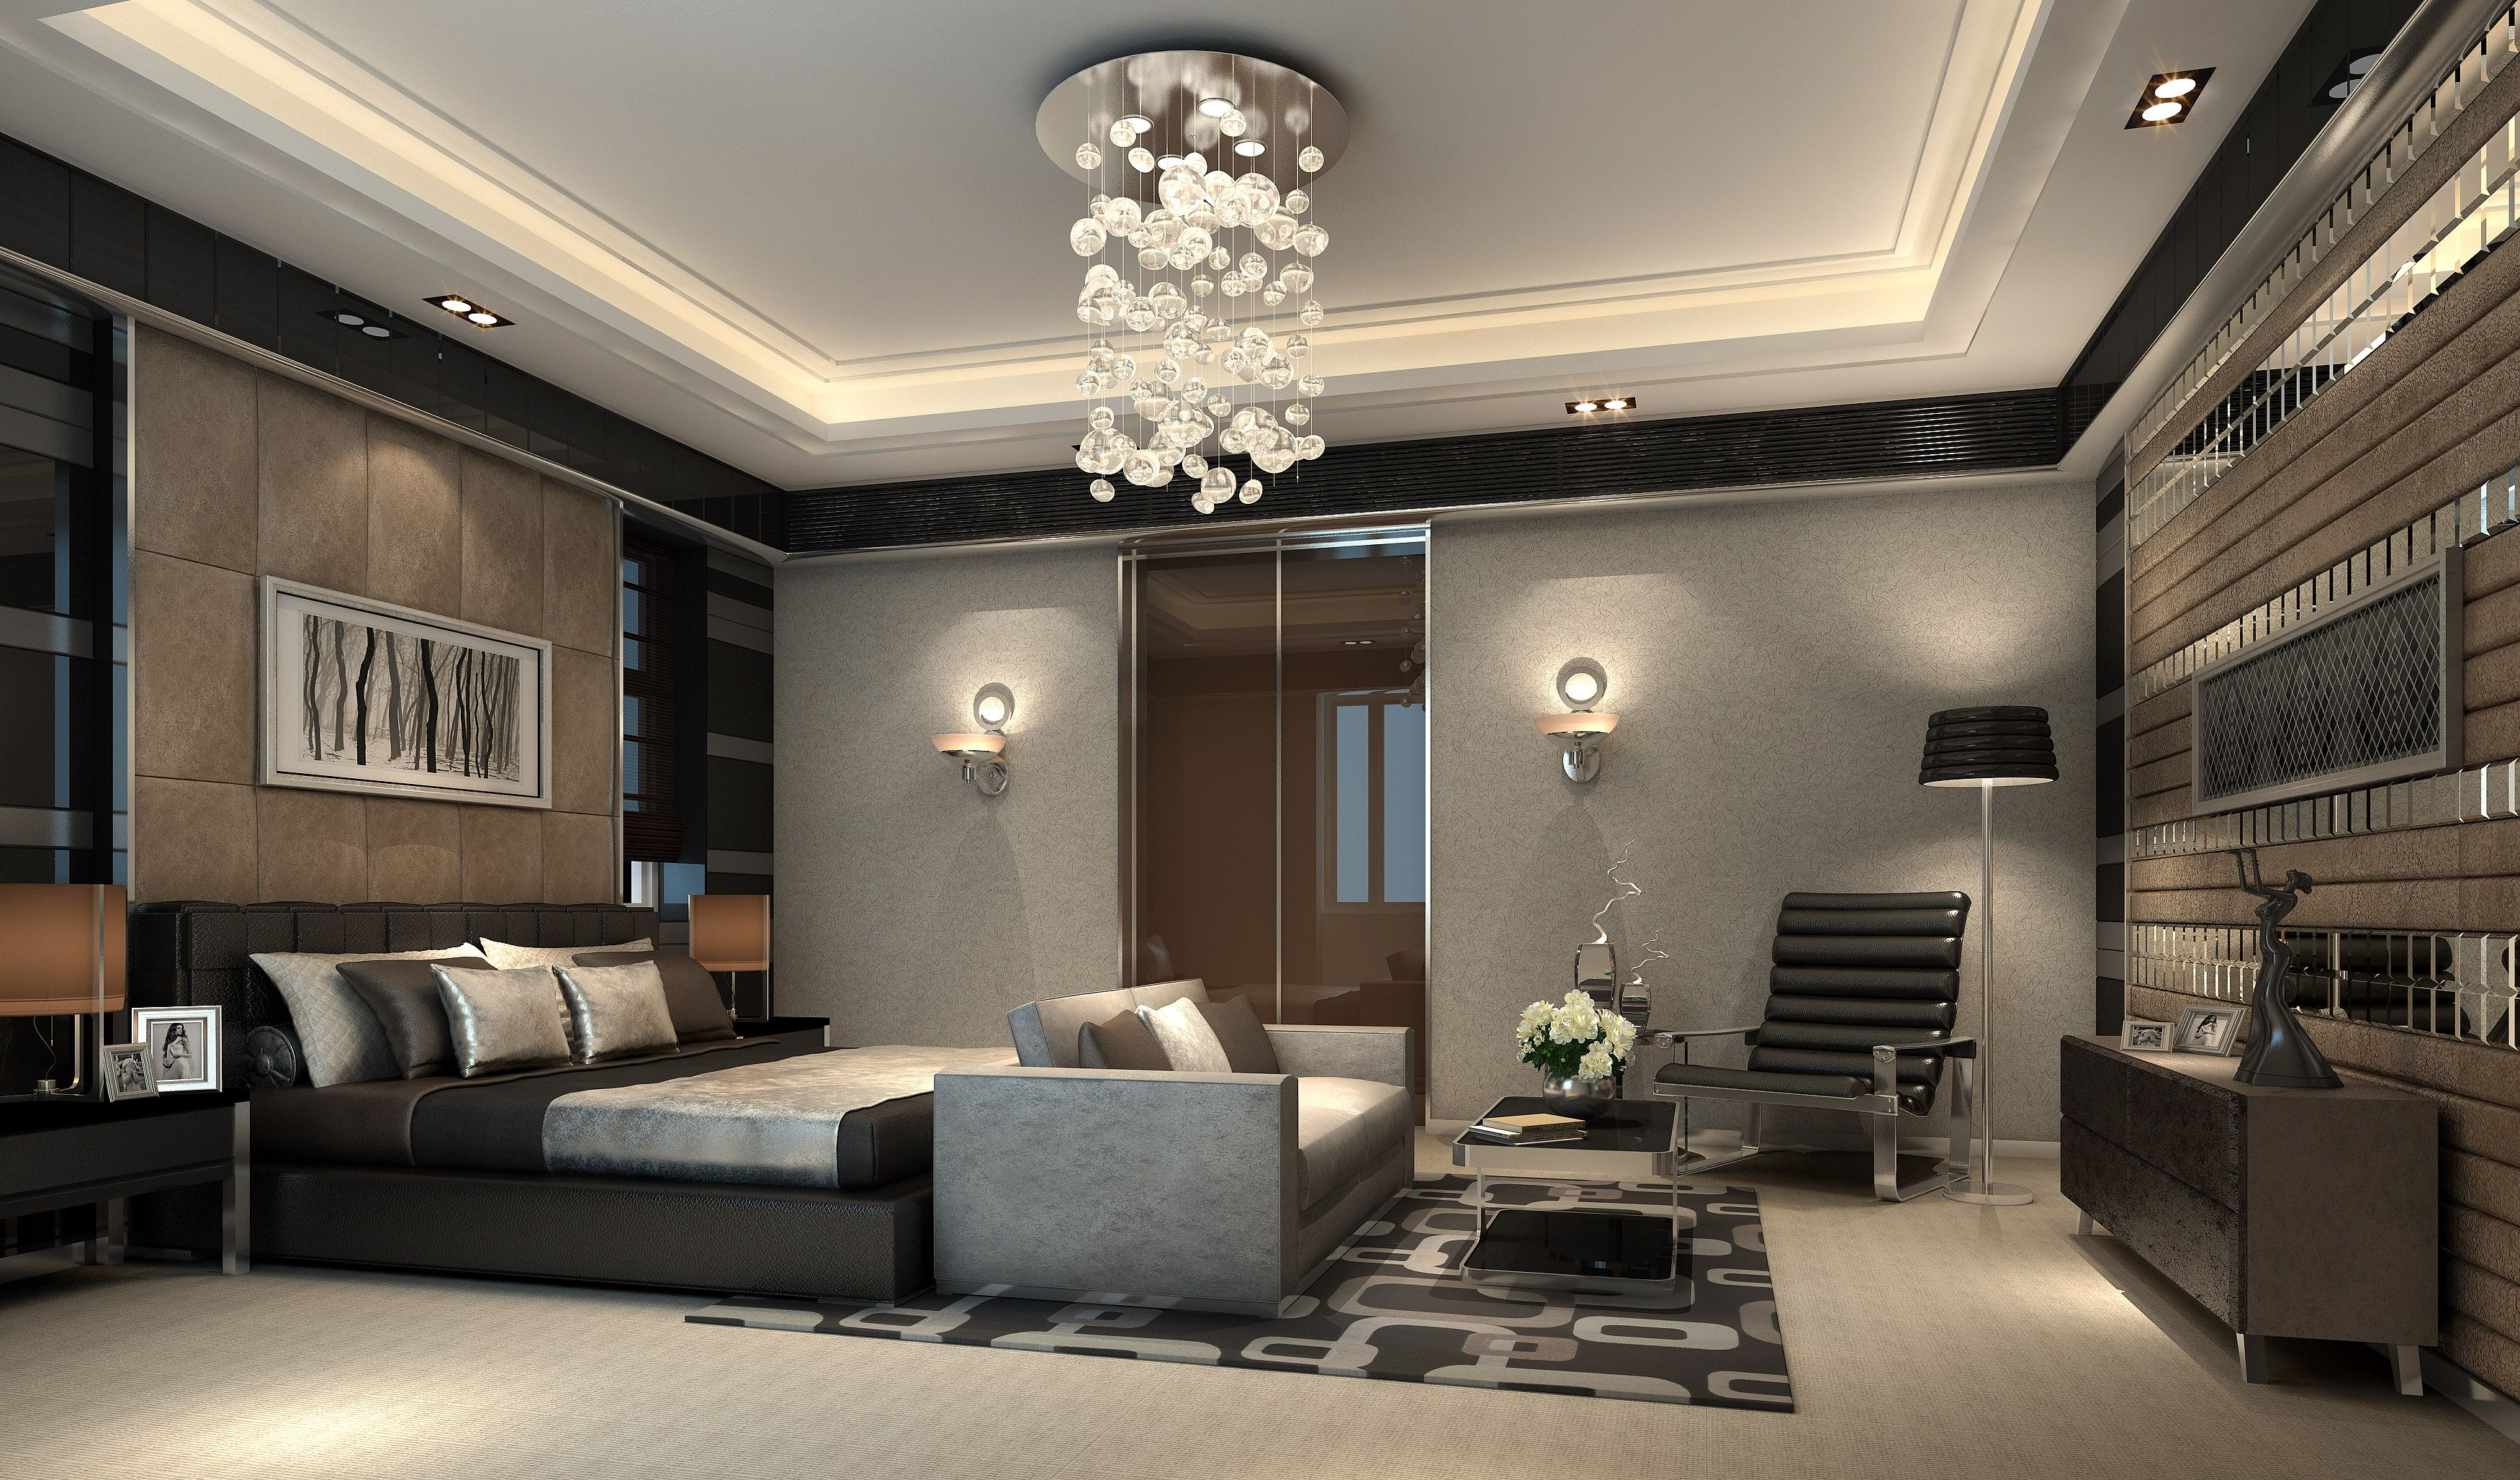 Best Amazing Luxury Bedroom Ideas Luxurious Bedrooms Modern 640 x 480